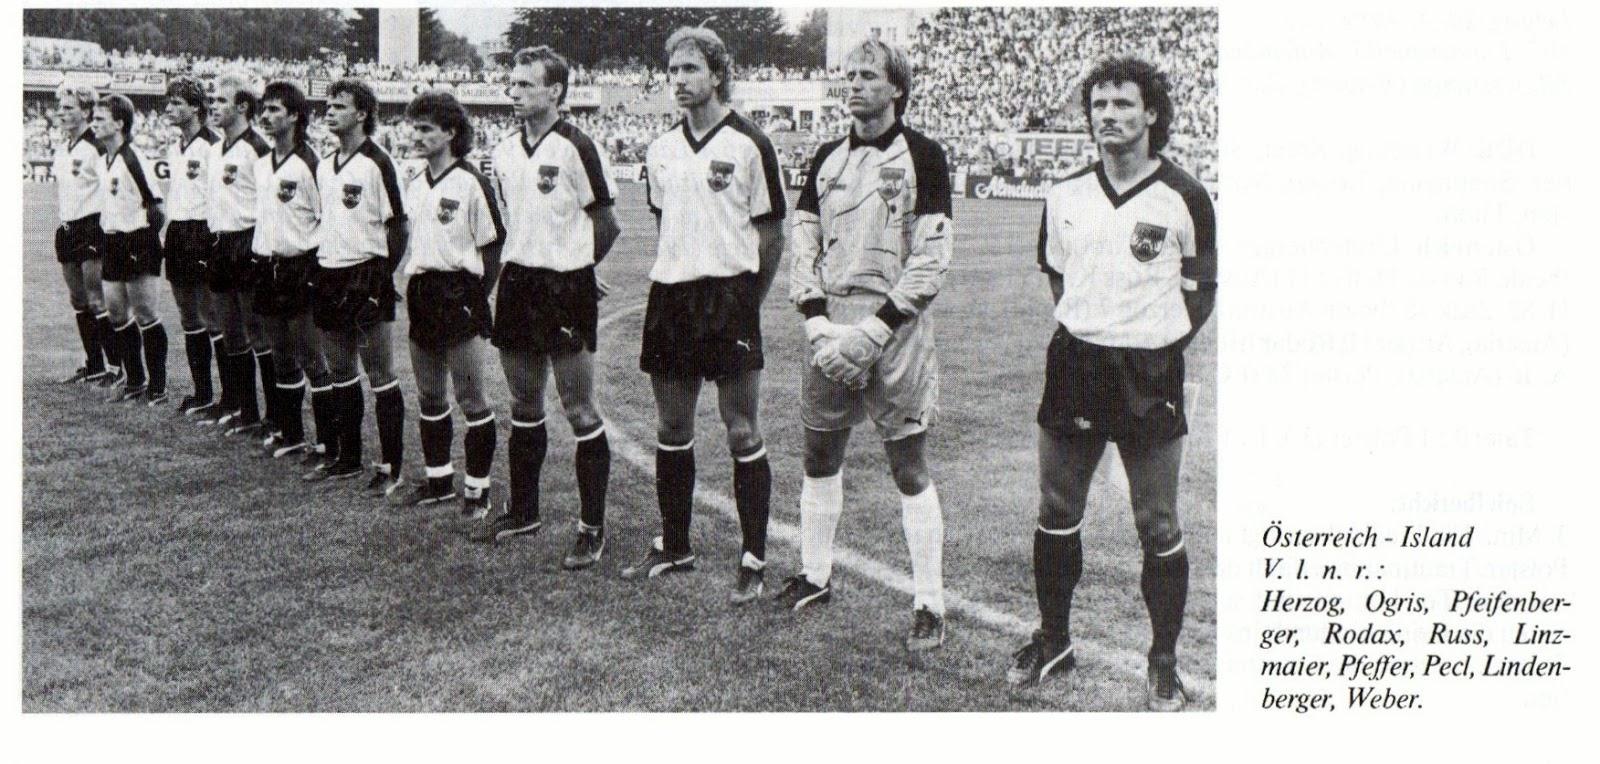 soccer nostalgia international season 1989 90, part 2  fu%c3%83%c2%9fball sweatshirts c 7 #6